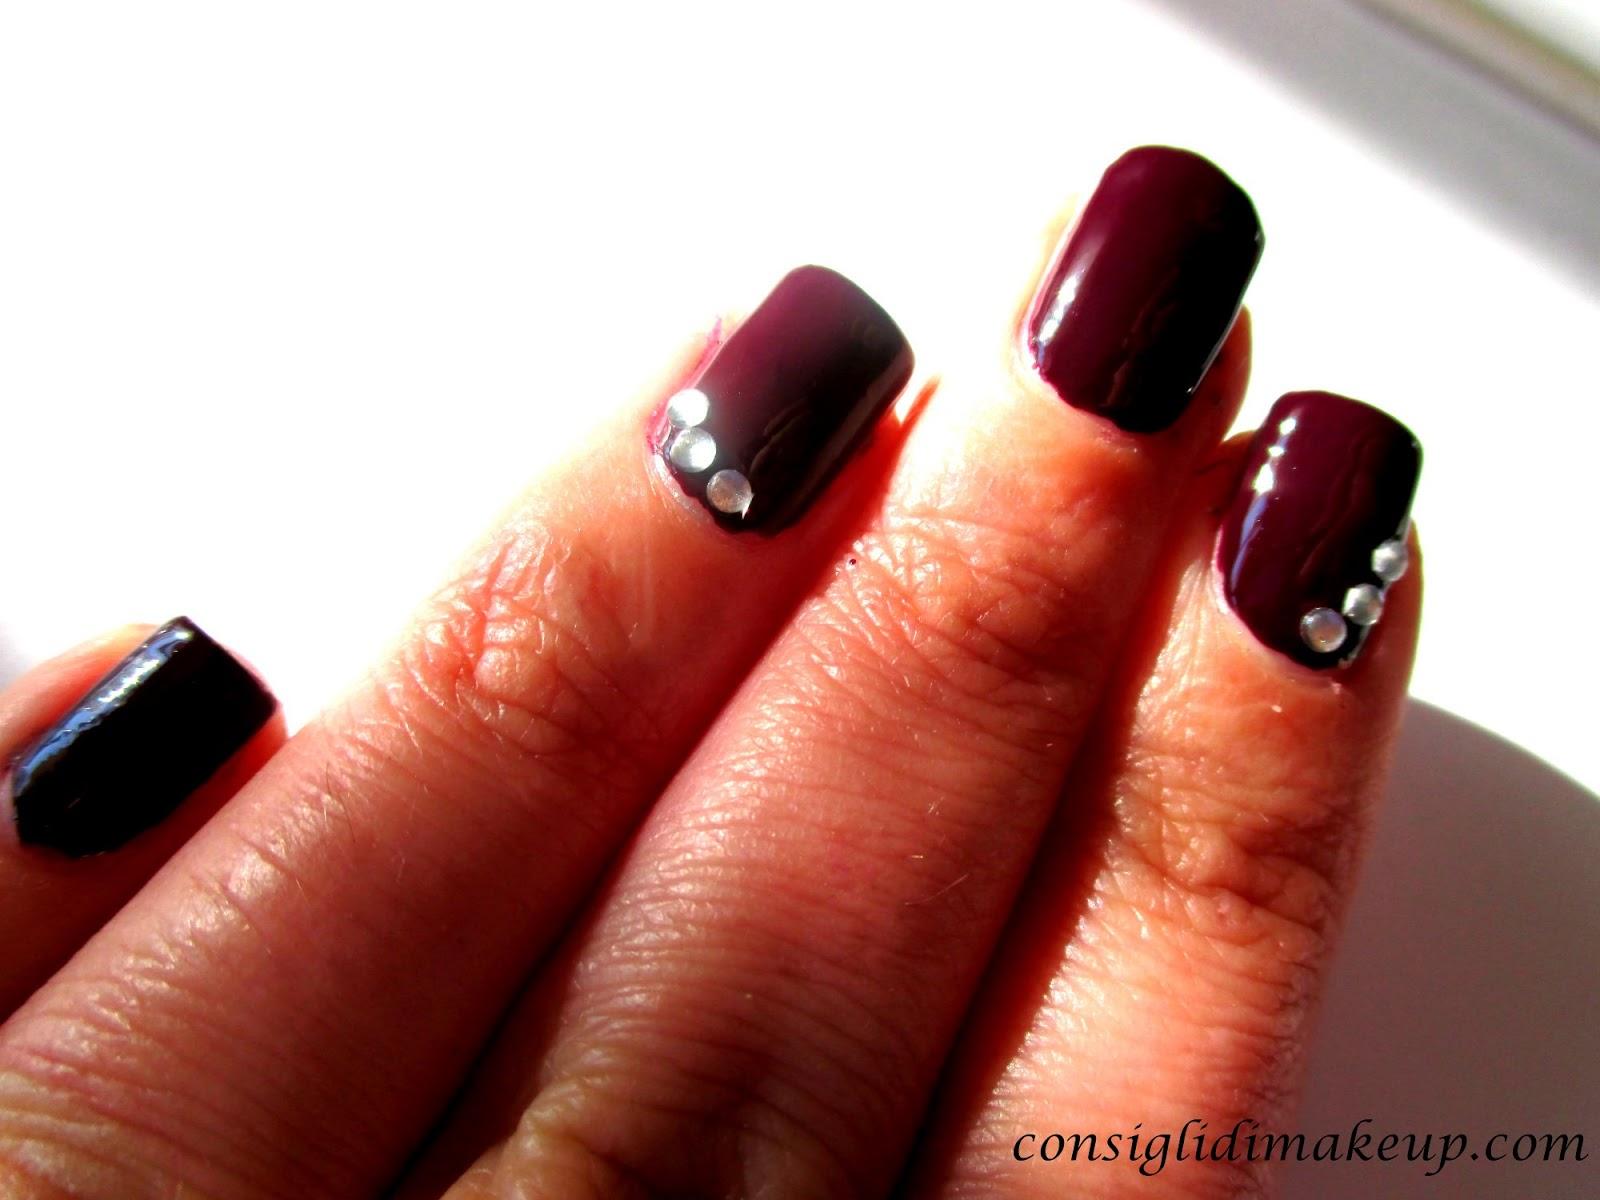 Nail art: easy & chic